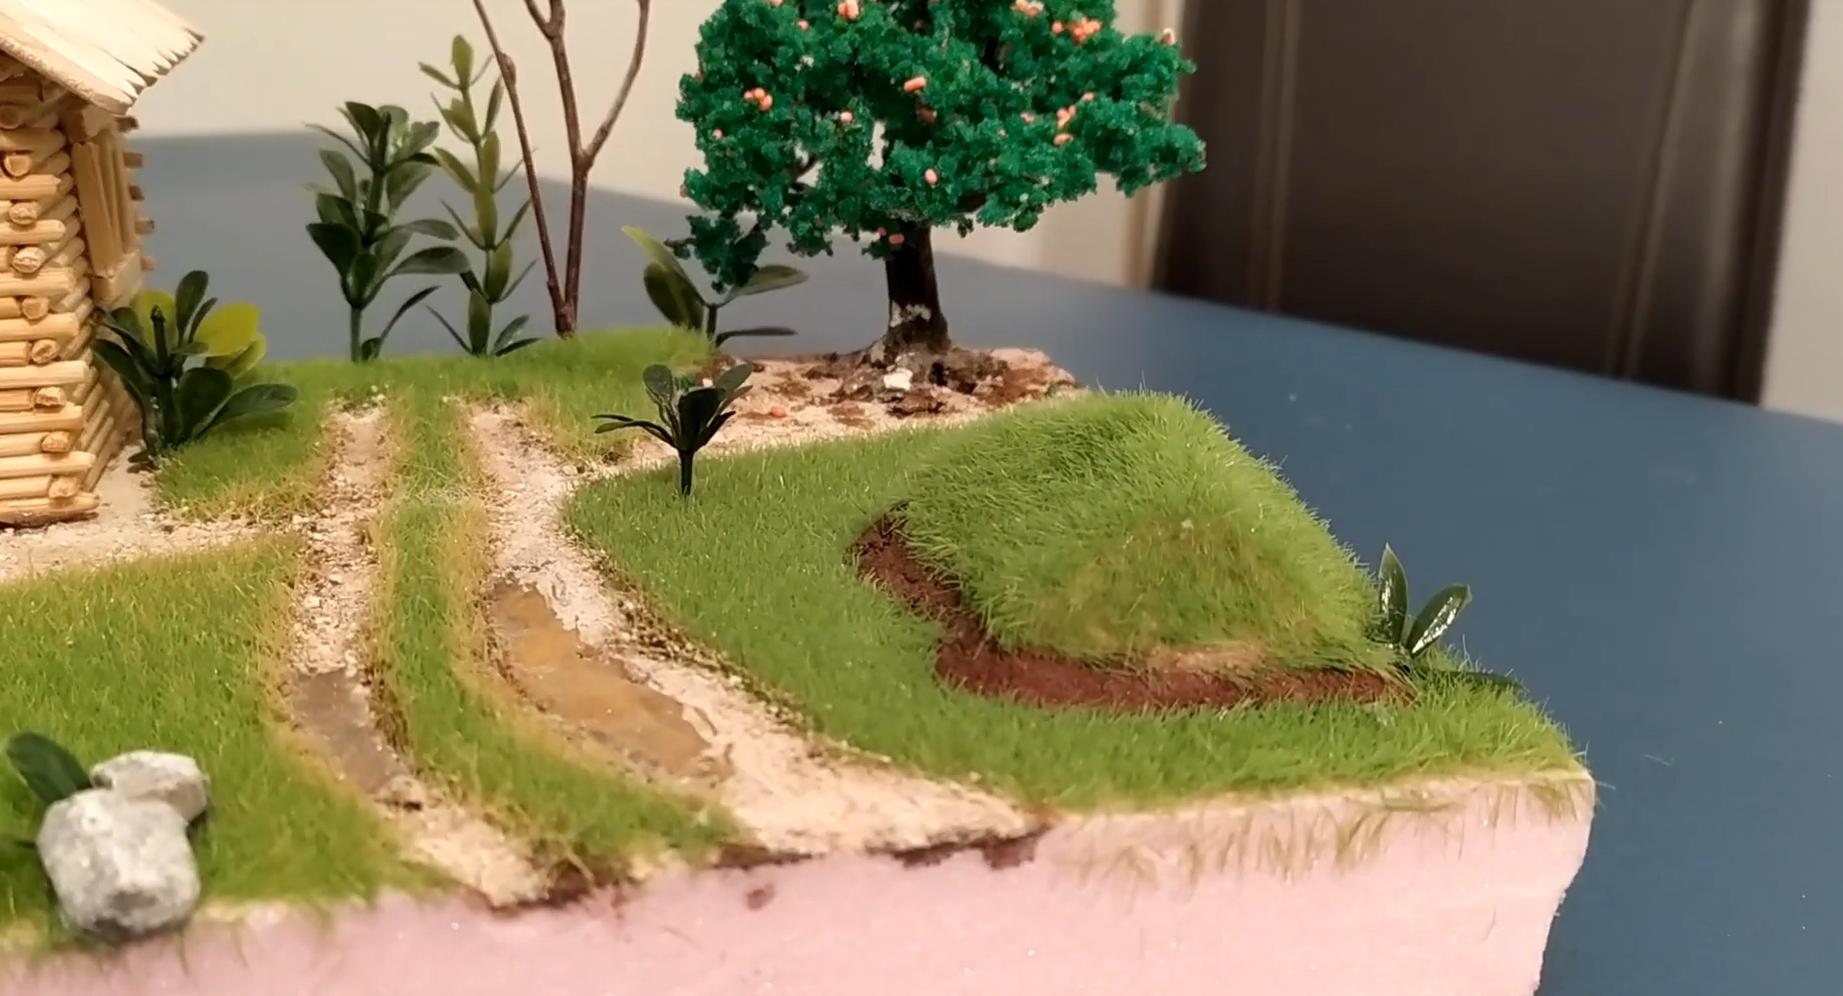 How to Make Grass For a Diorama